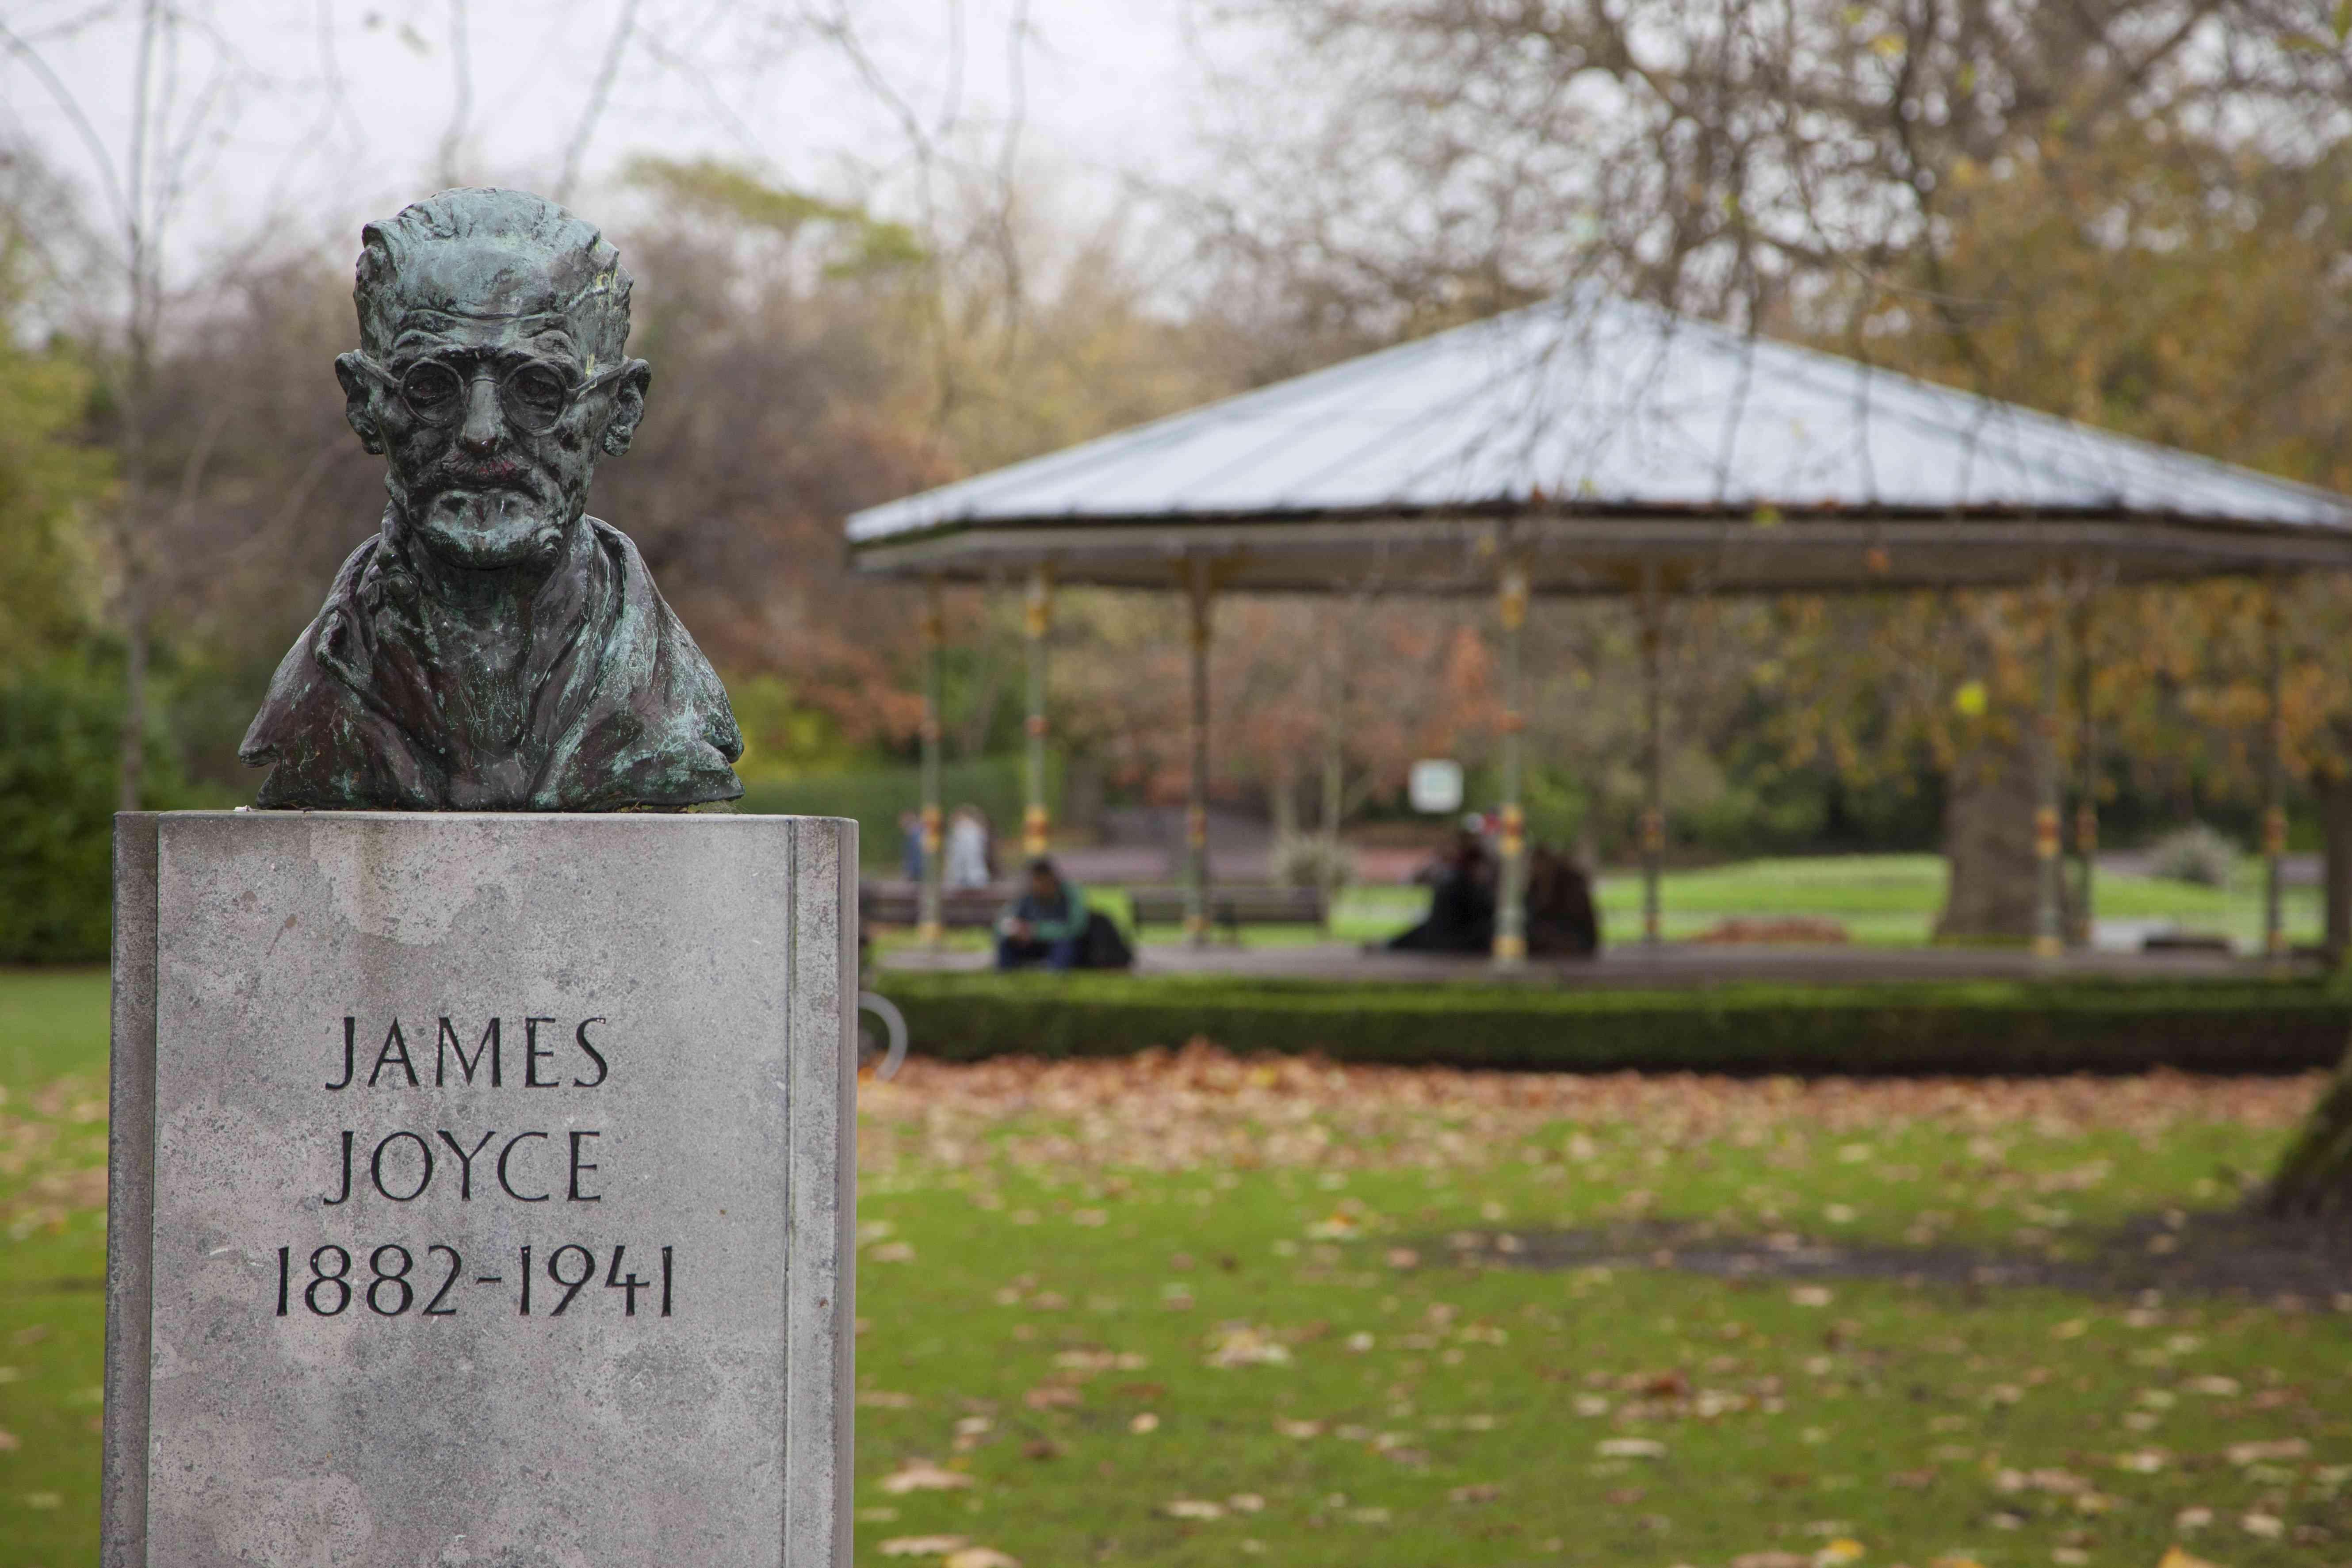 James Joyce Bust in Dublin